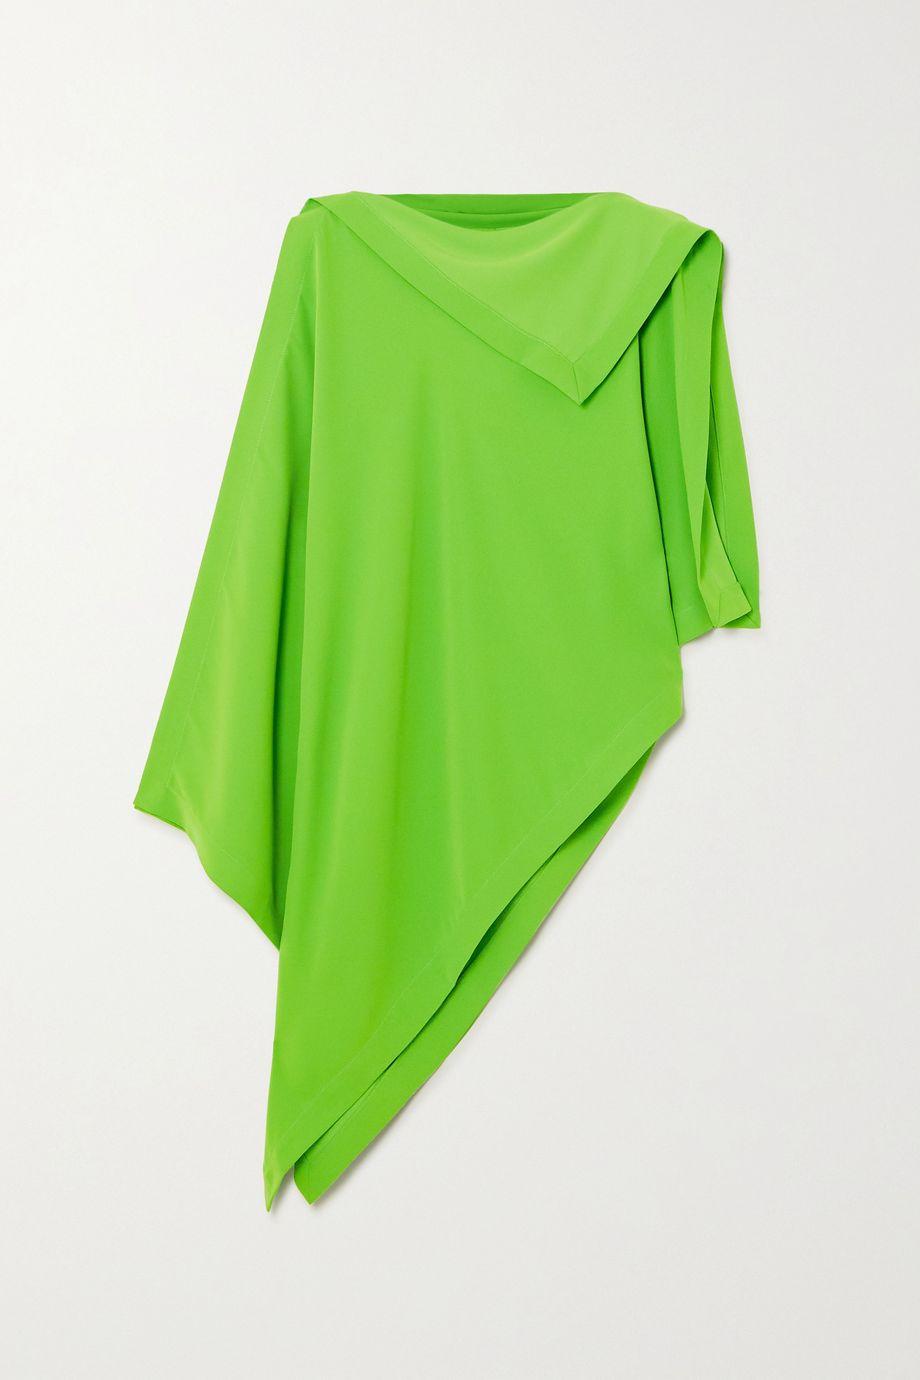 MM6 Maison Margiela Asymmetric draped crepe top